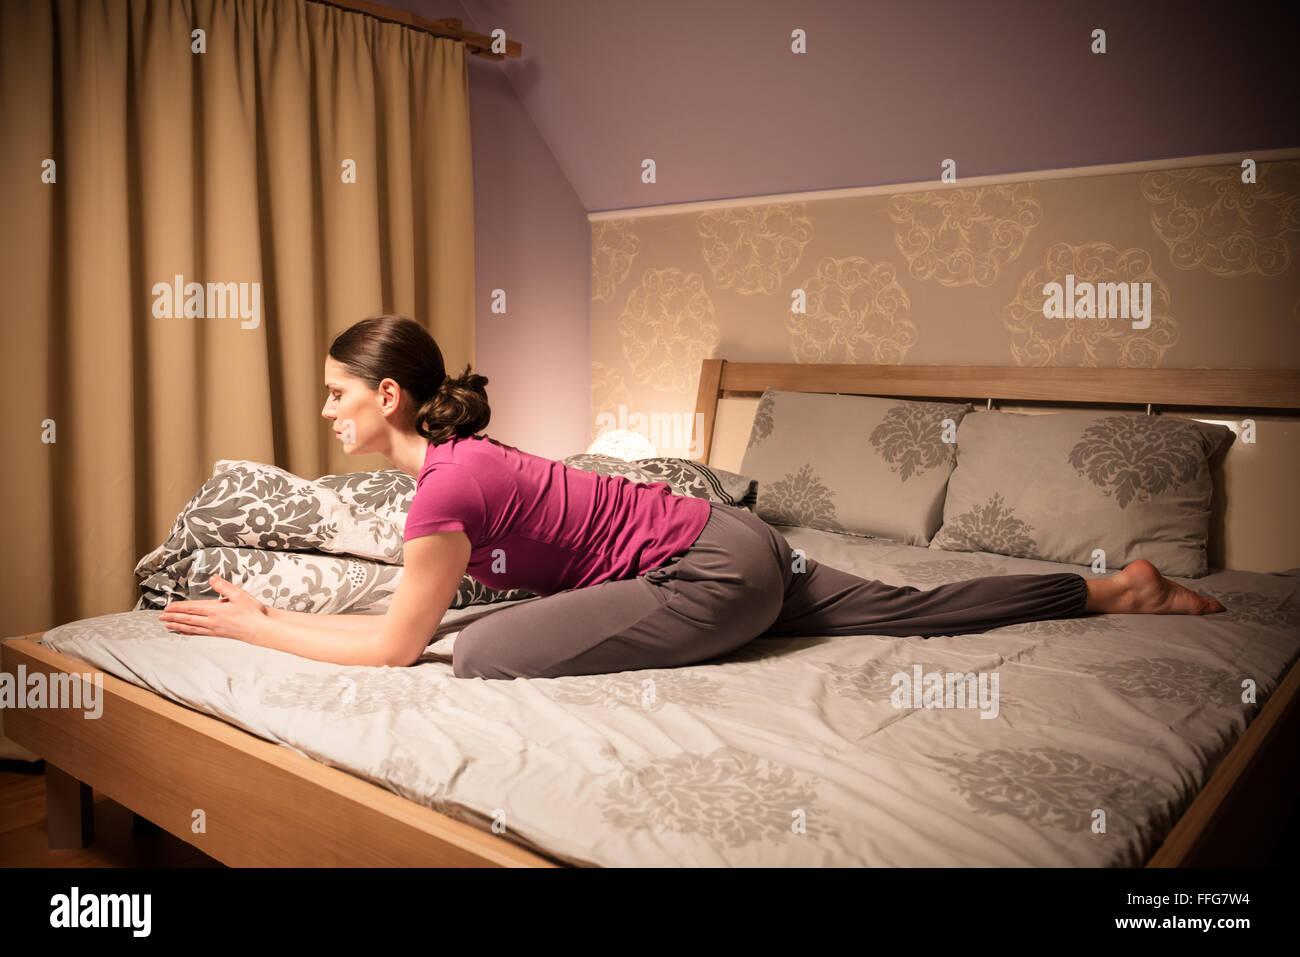 Young woman doing the Pigeon yoga pose before going to sleep. - Stock Image